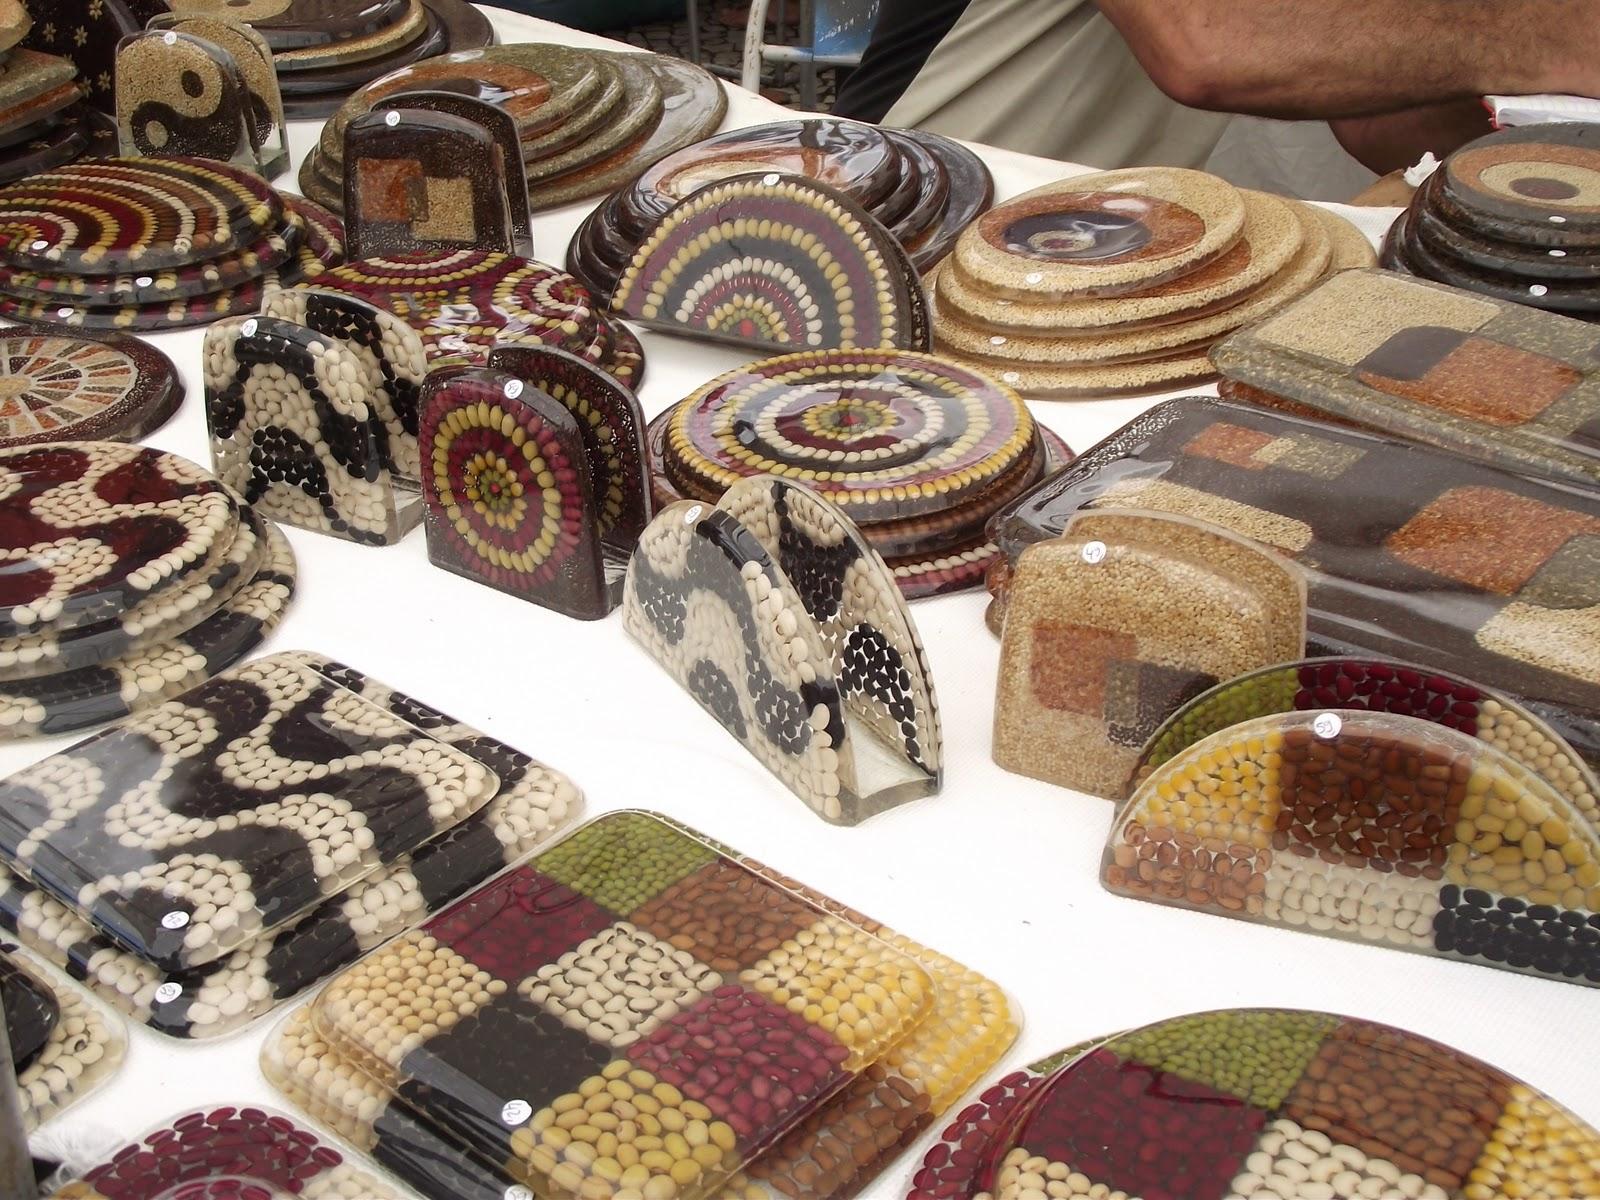 Artes da Feira Hippie de Ipanema: Artesanato com resina poliester #AA8221 1600x1200 Acessórios Banheiro Resina Poliester